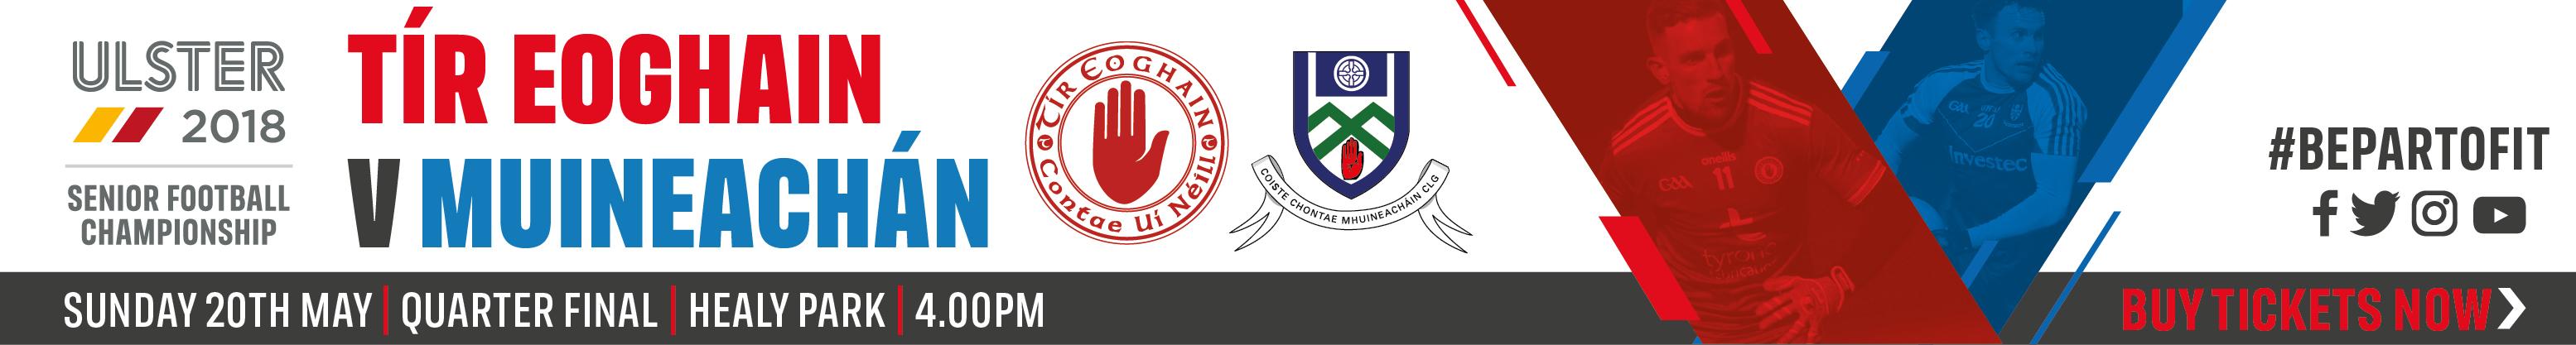 Ulster Senior Championship QF - Tyrone v Monaghan